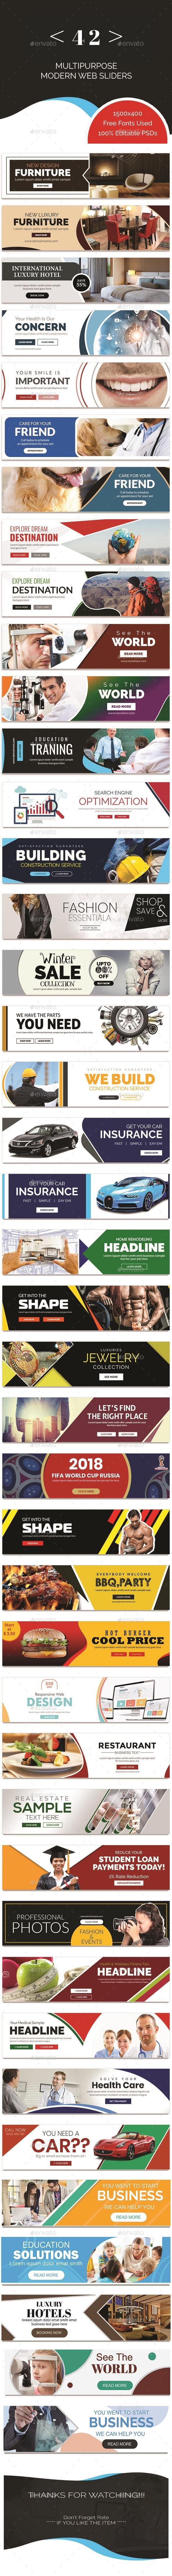 Multipurpose Web Sliders Pack - 42 Designs - Banners & Ads Web Elements